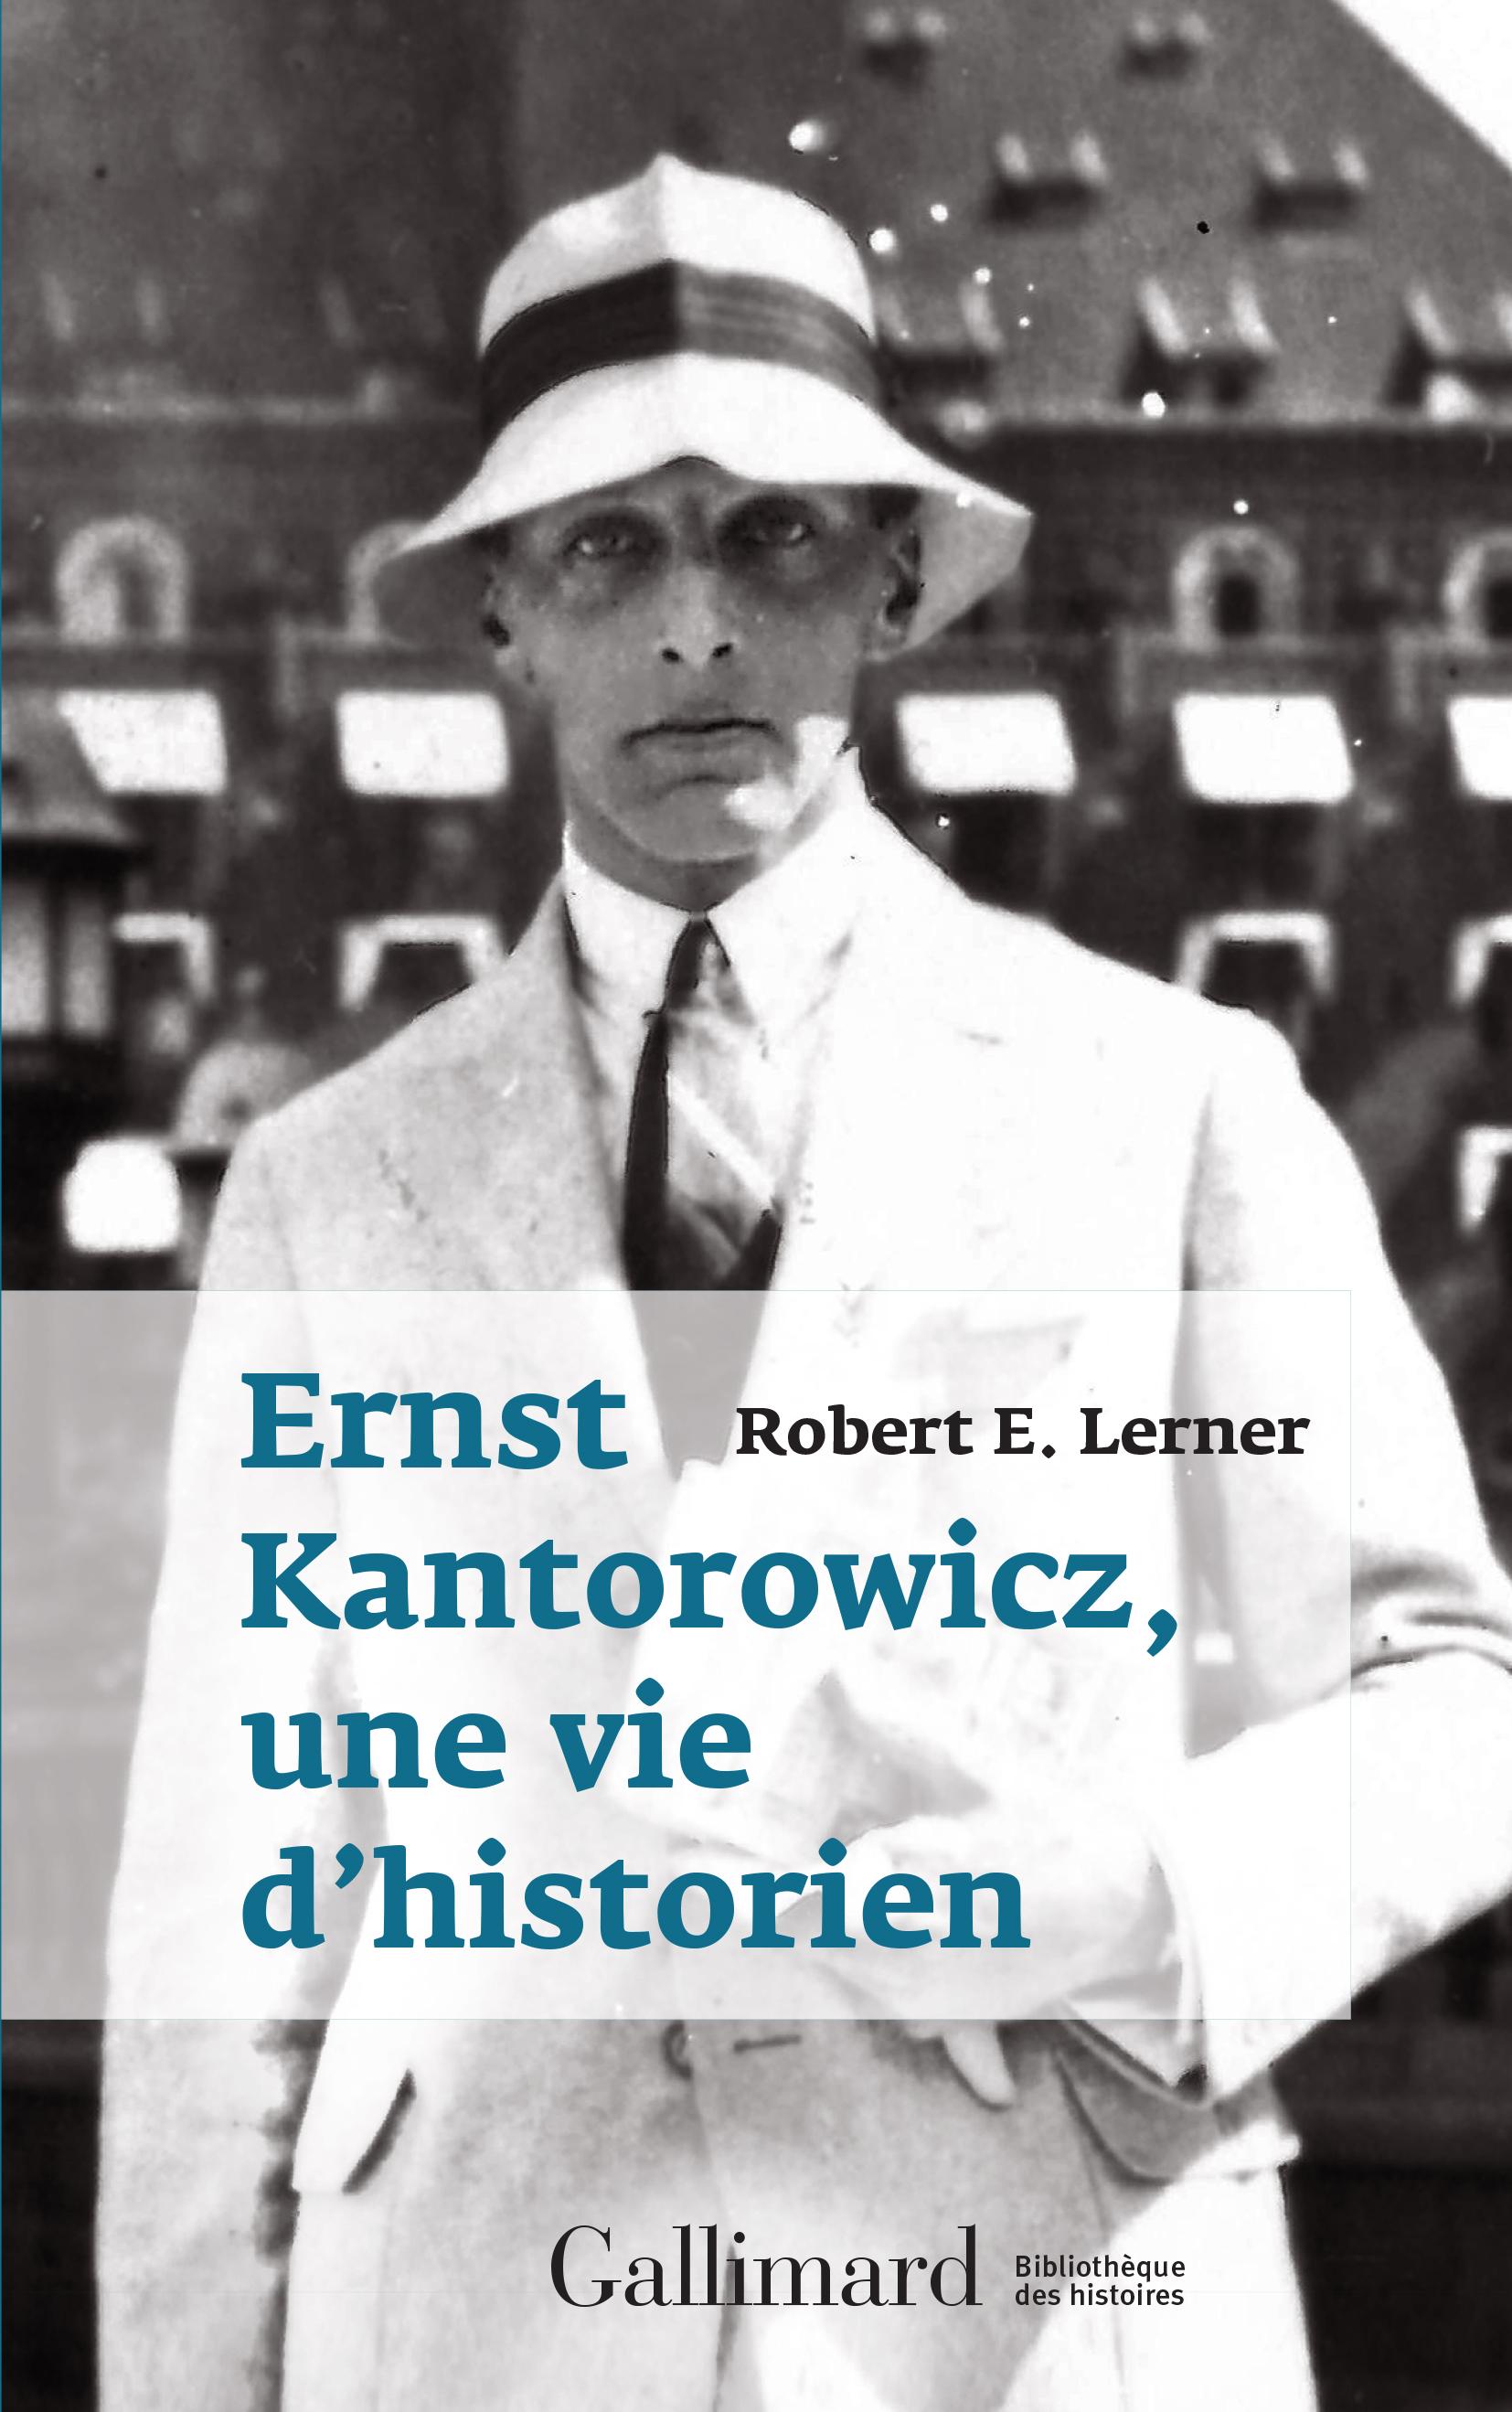 R.E. Lerner, Ernst Kantorowicz, une vie d'historien